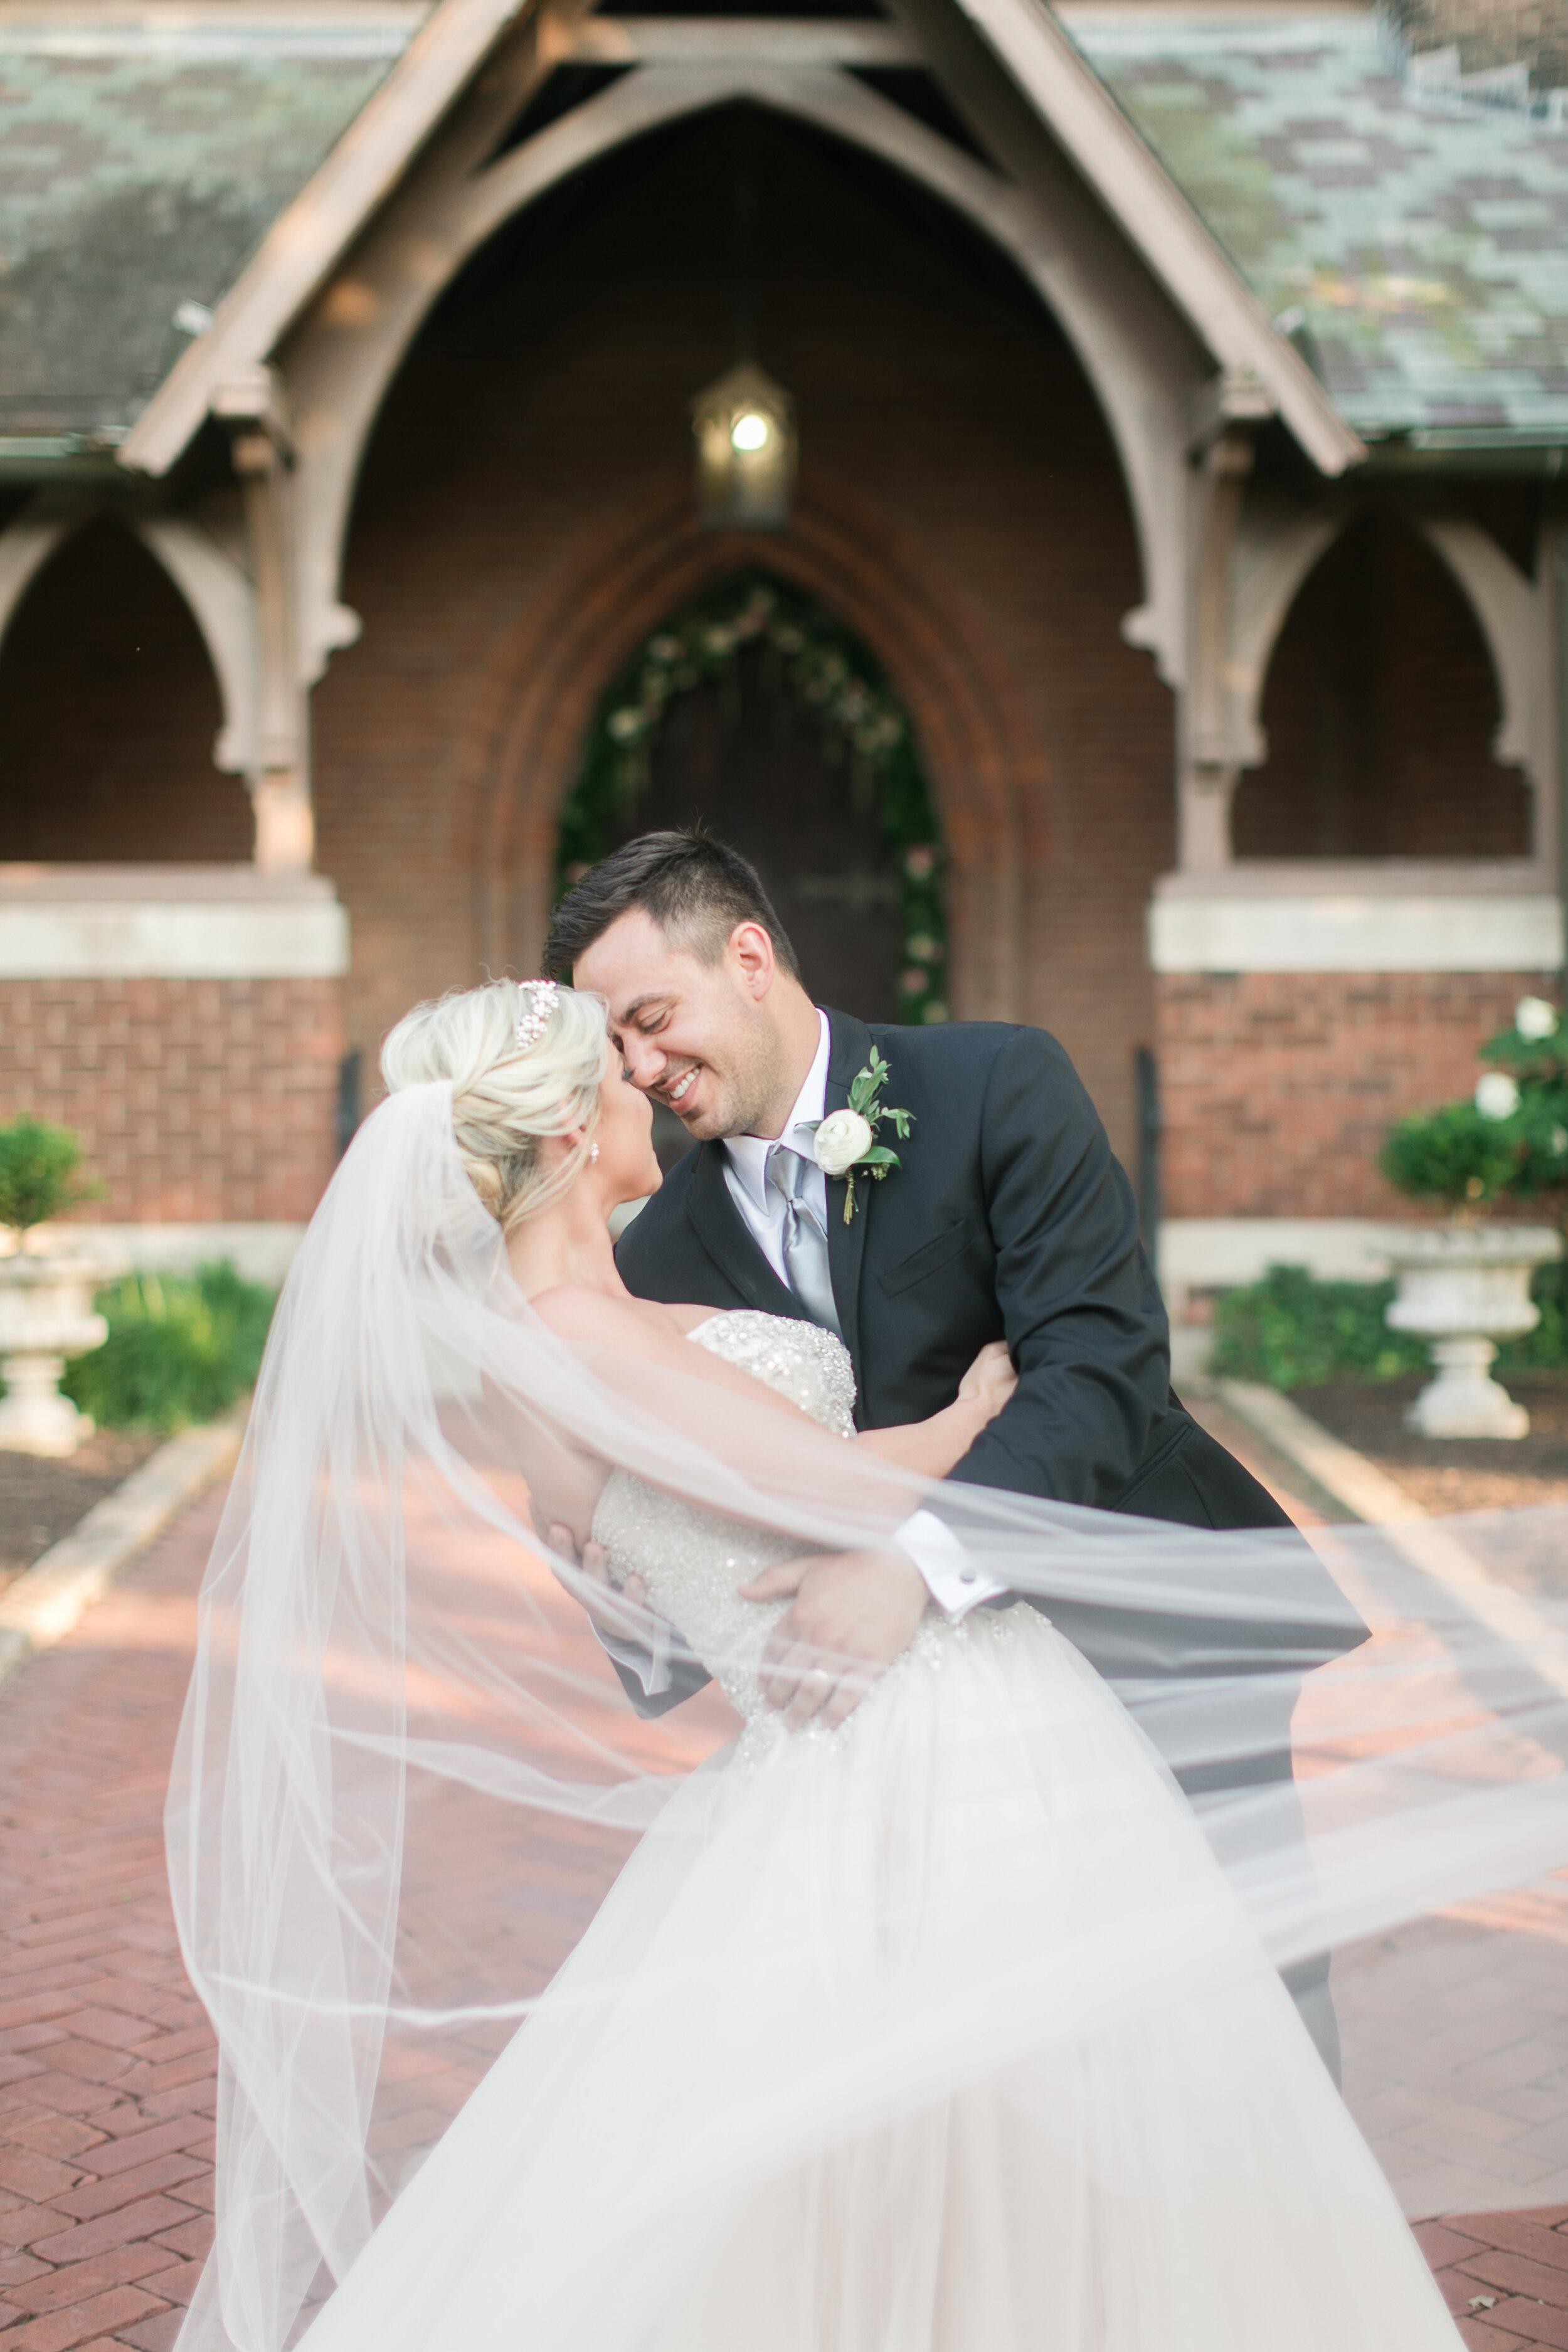 Holly-David-wedding-501.jpg